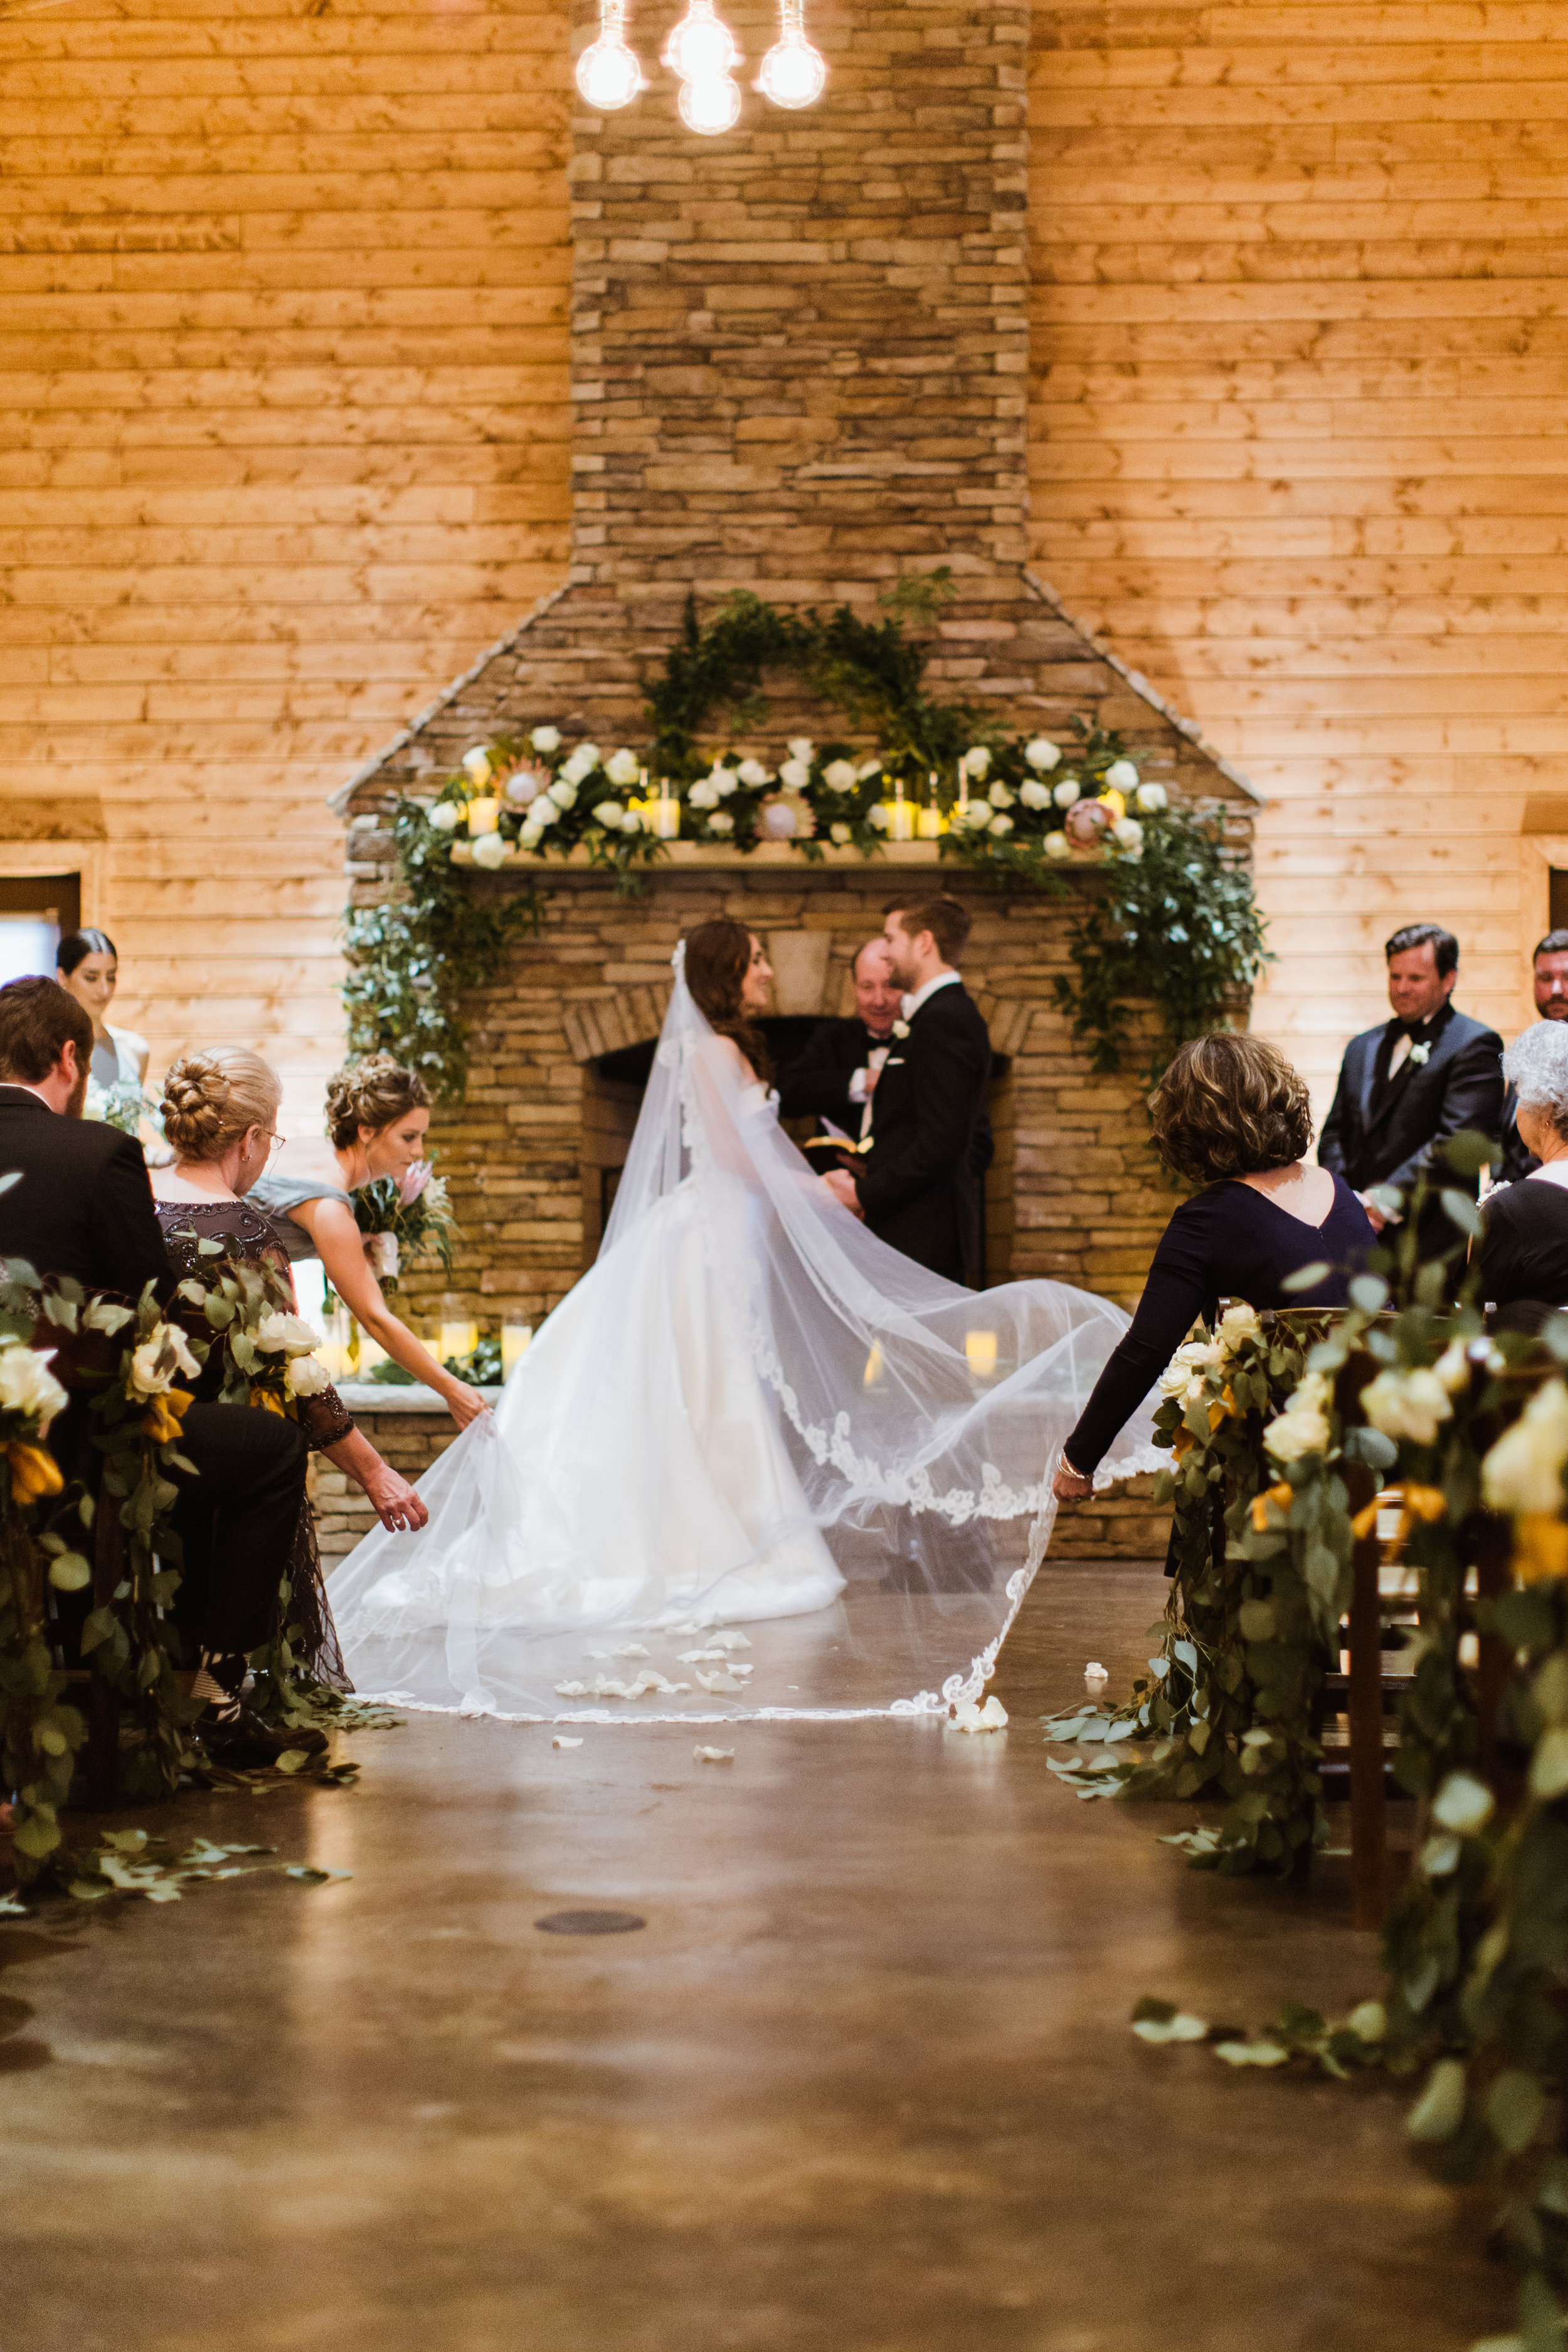 WeddingtonWedding0642.jpg